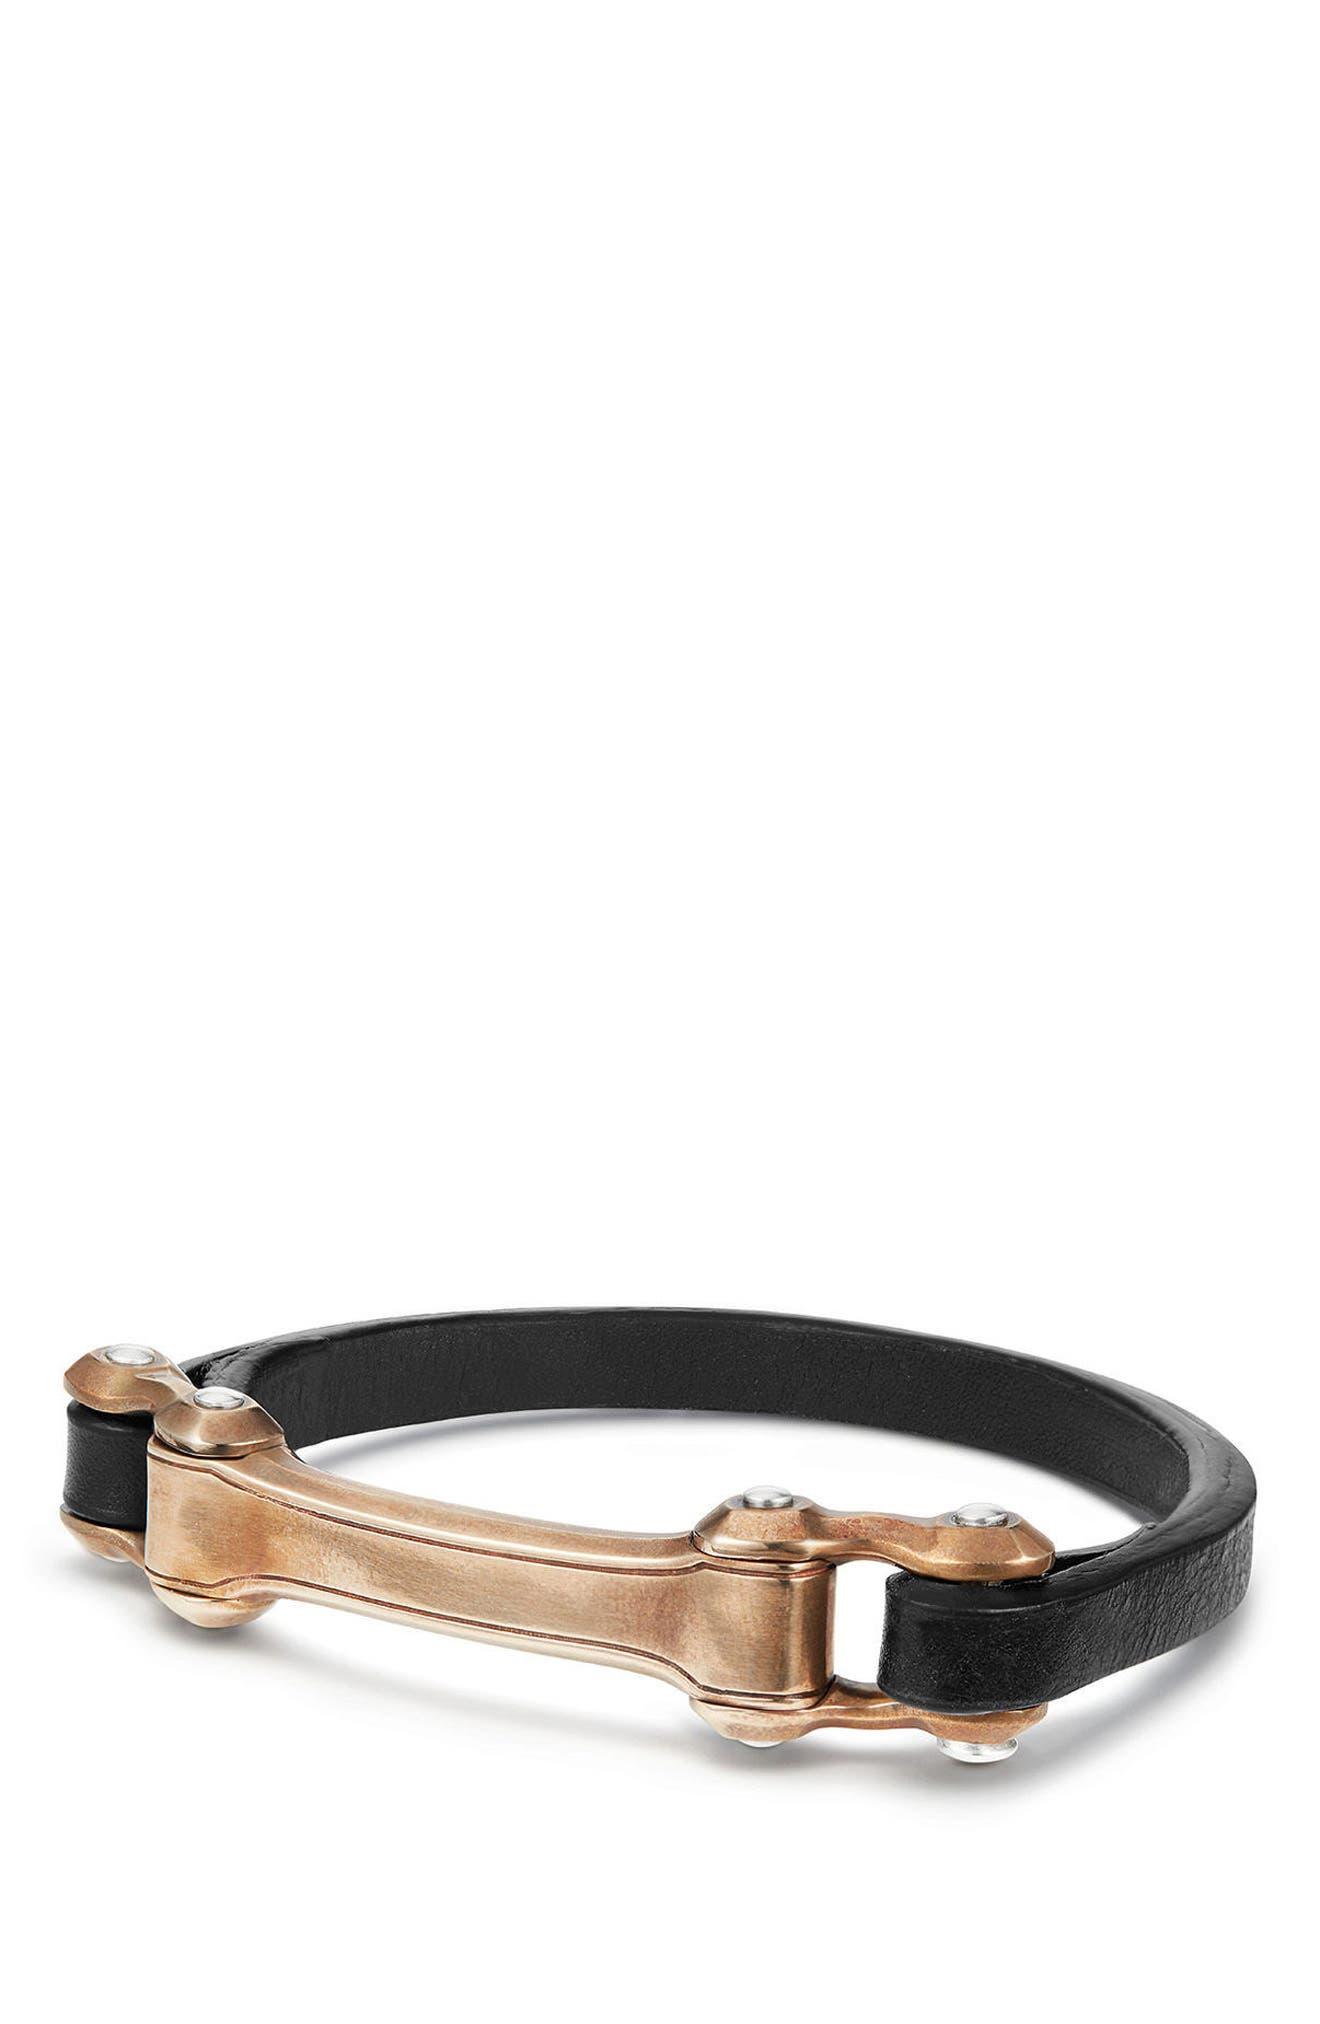 Anvil ID Bracelet,                             Main thumbnail 1, color,                             Silver/ Bronze/ Black Leather